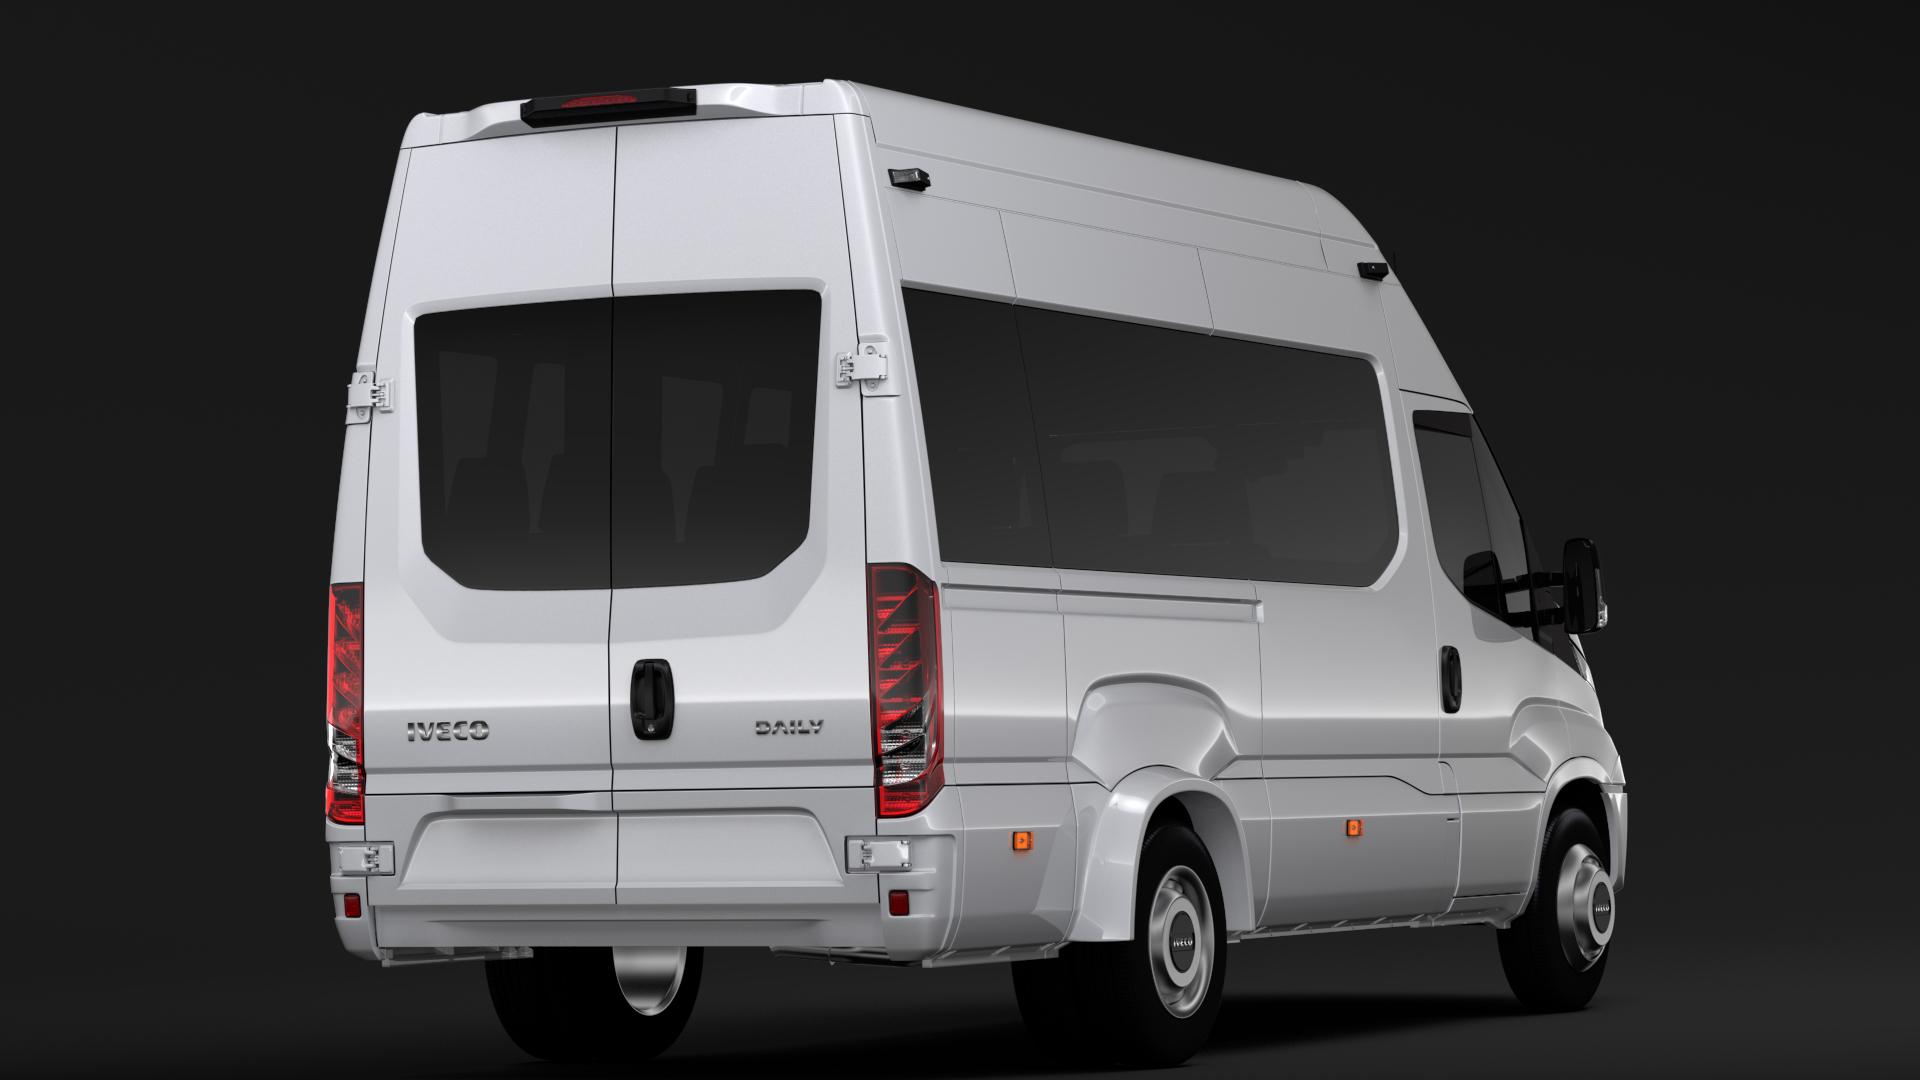 iveco daily minibus l3h3 2017 3d model max fbx c4d lwo ma mb hrc xsi obj 276146